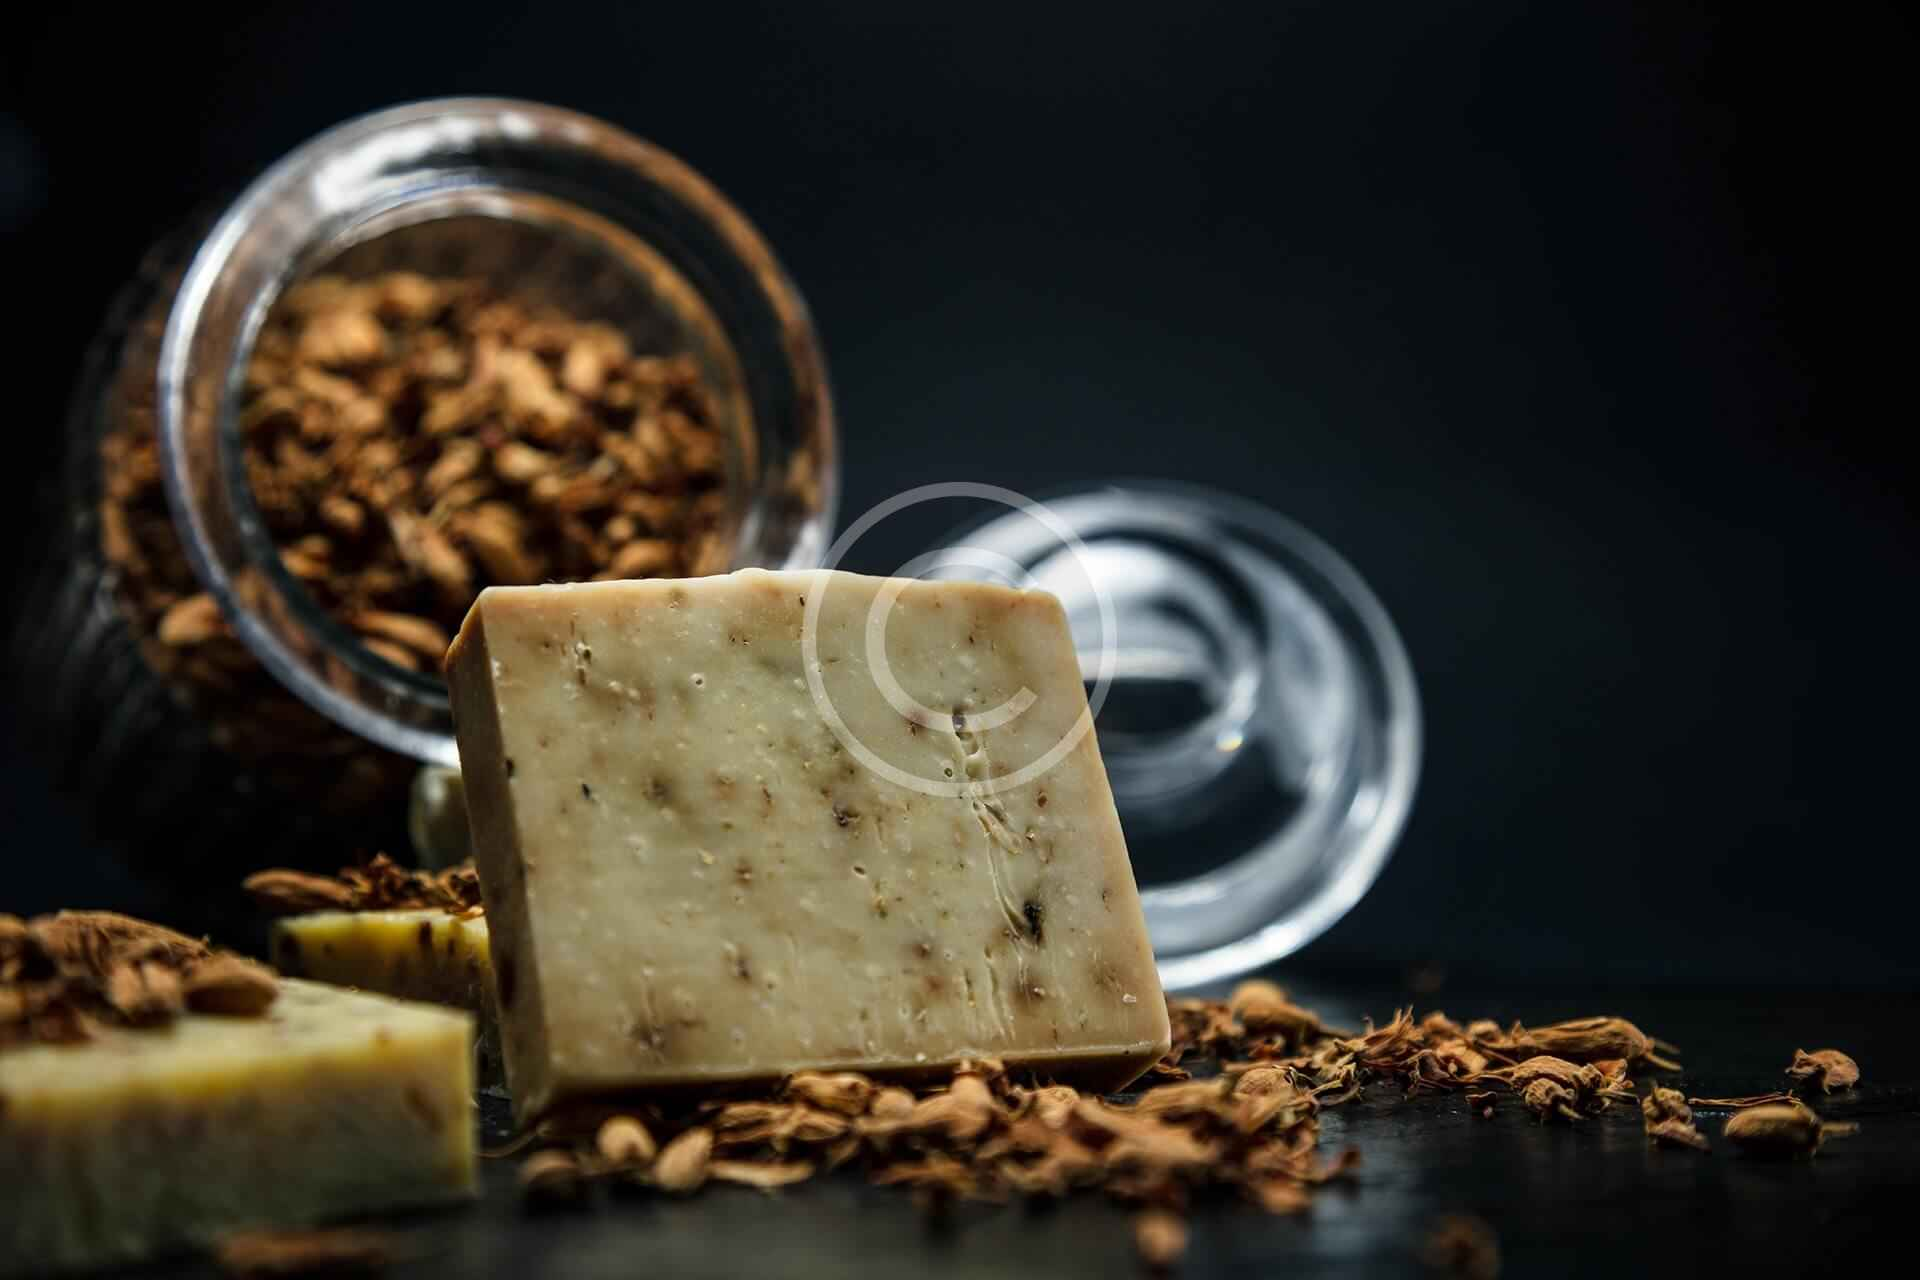 Handmade soap classes